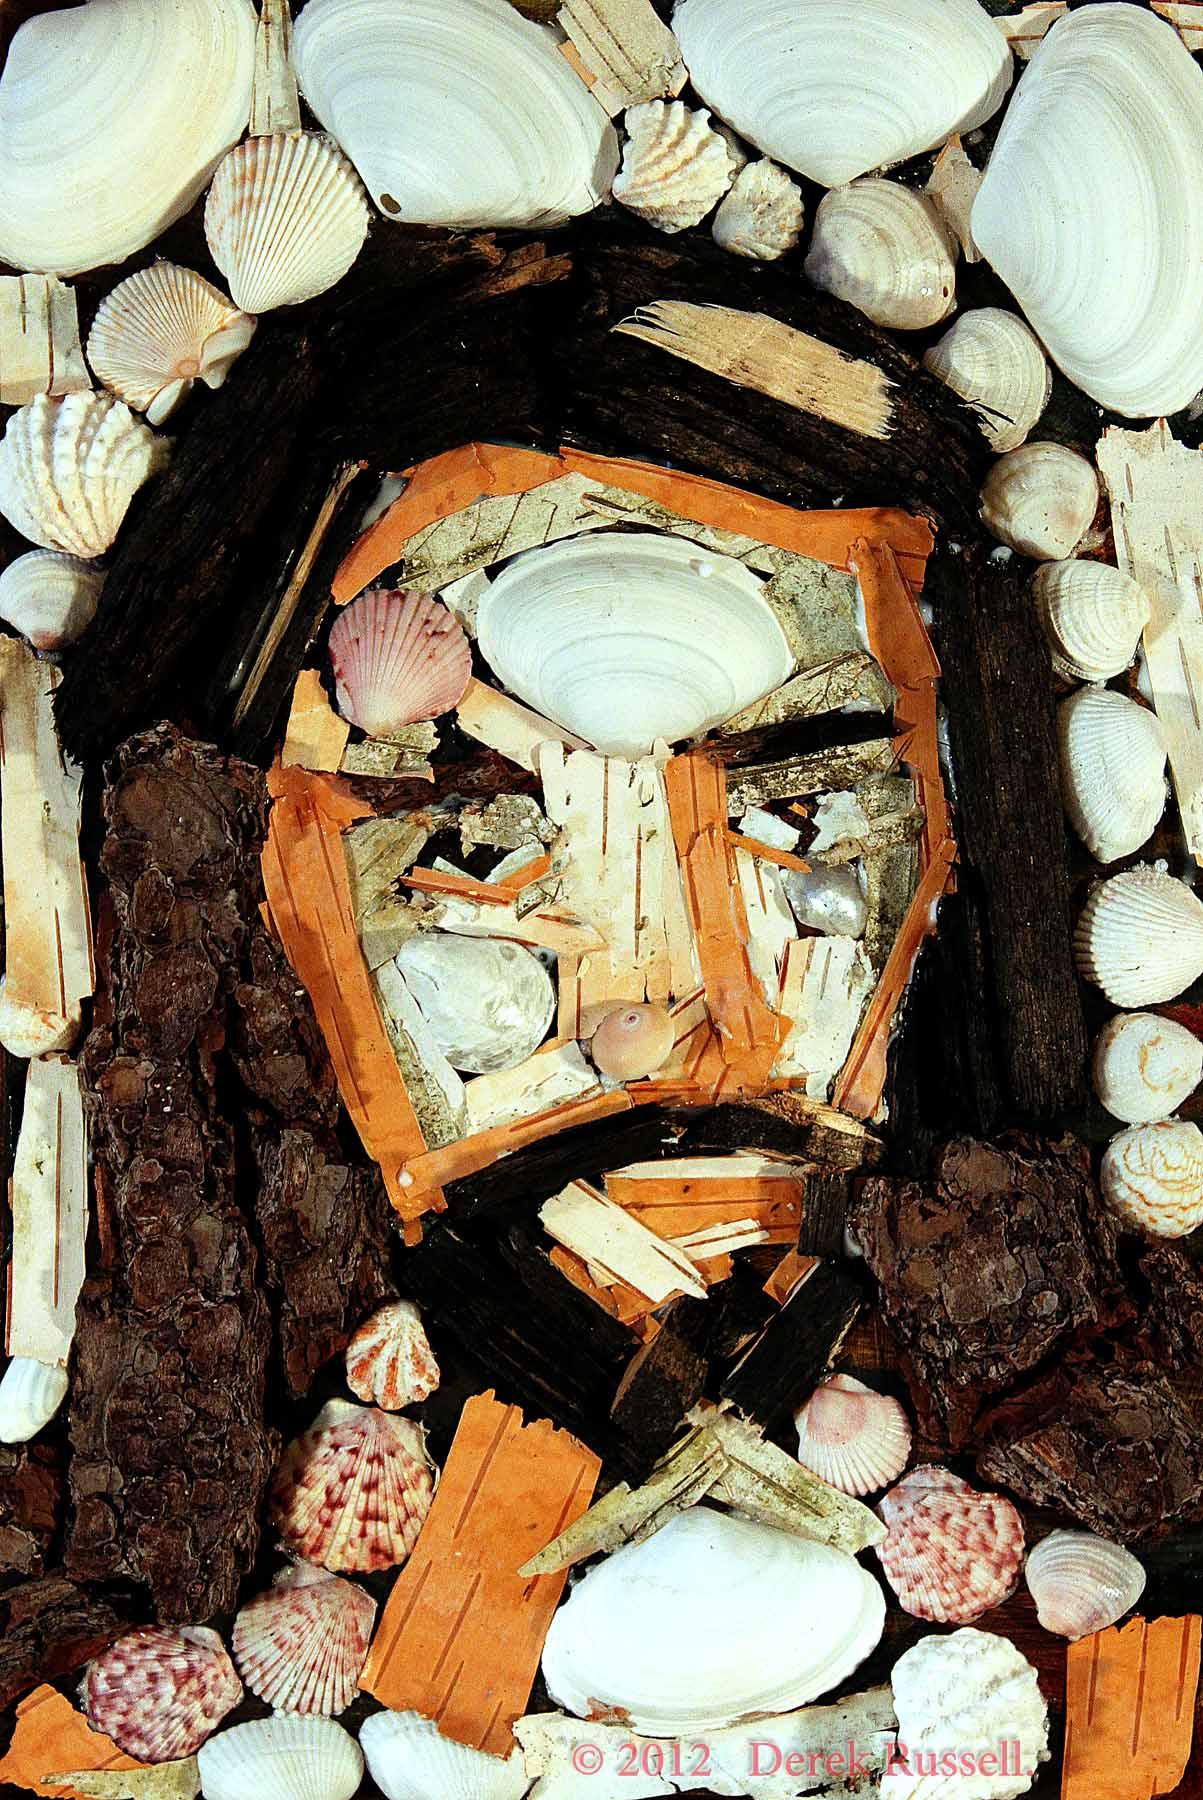 Jesus Original Fine Art Nature Mosaic by Celebrity & Corporate Artist Derek Russell